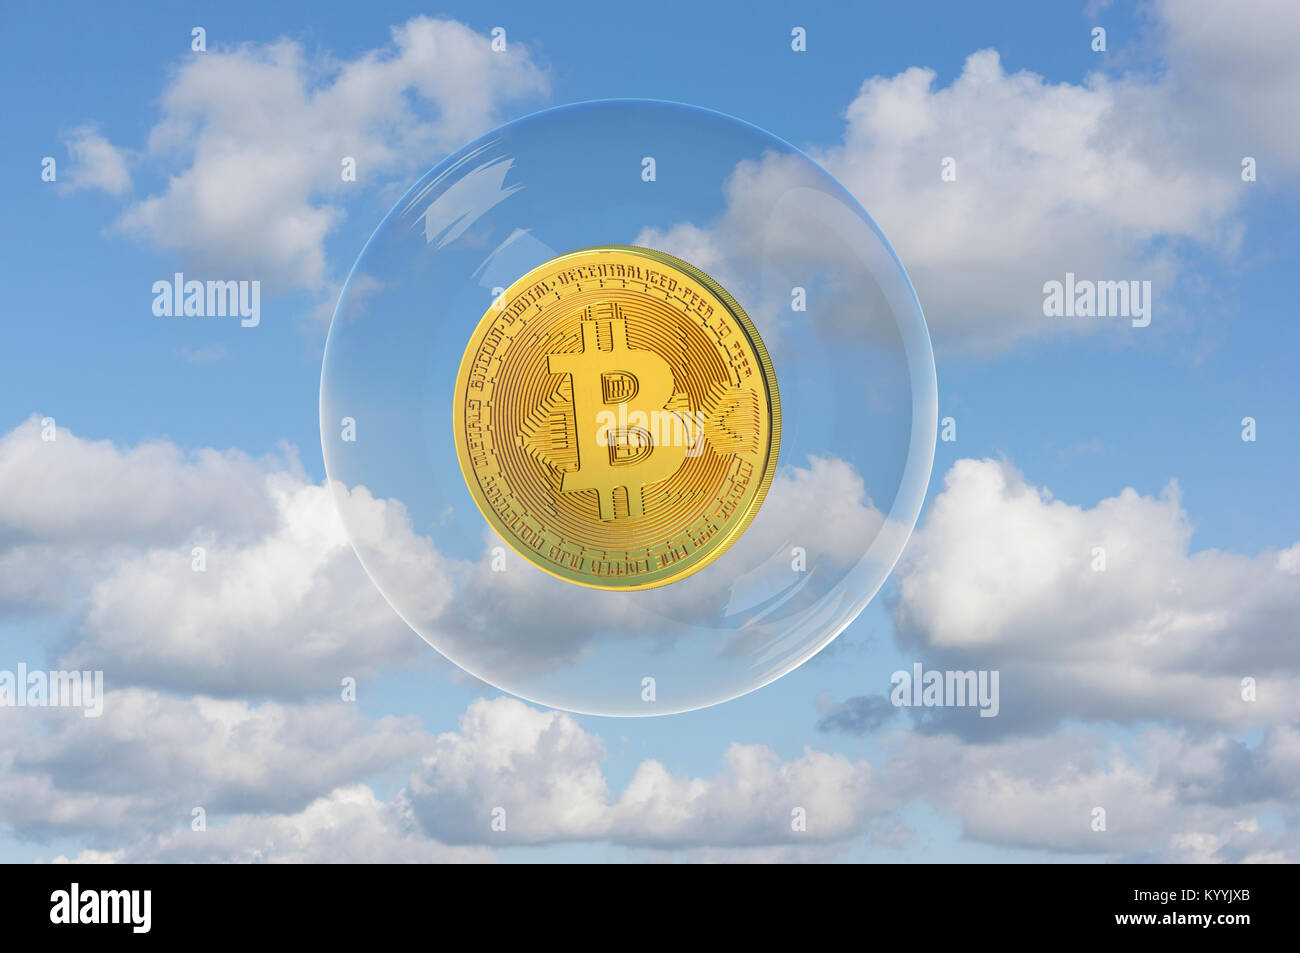 Bitcoin flotando en una burbuja - Concepto de valoración Imagen De Stock